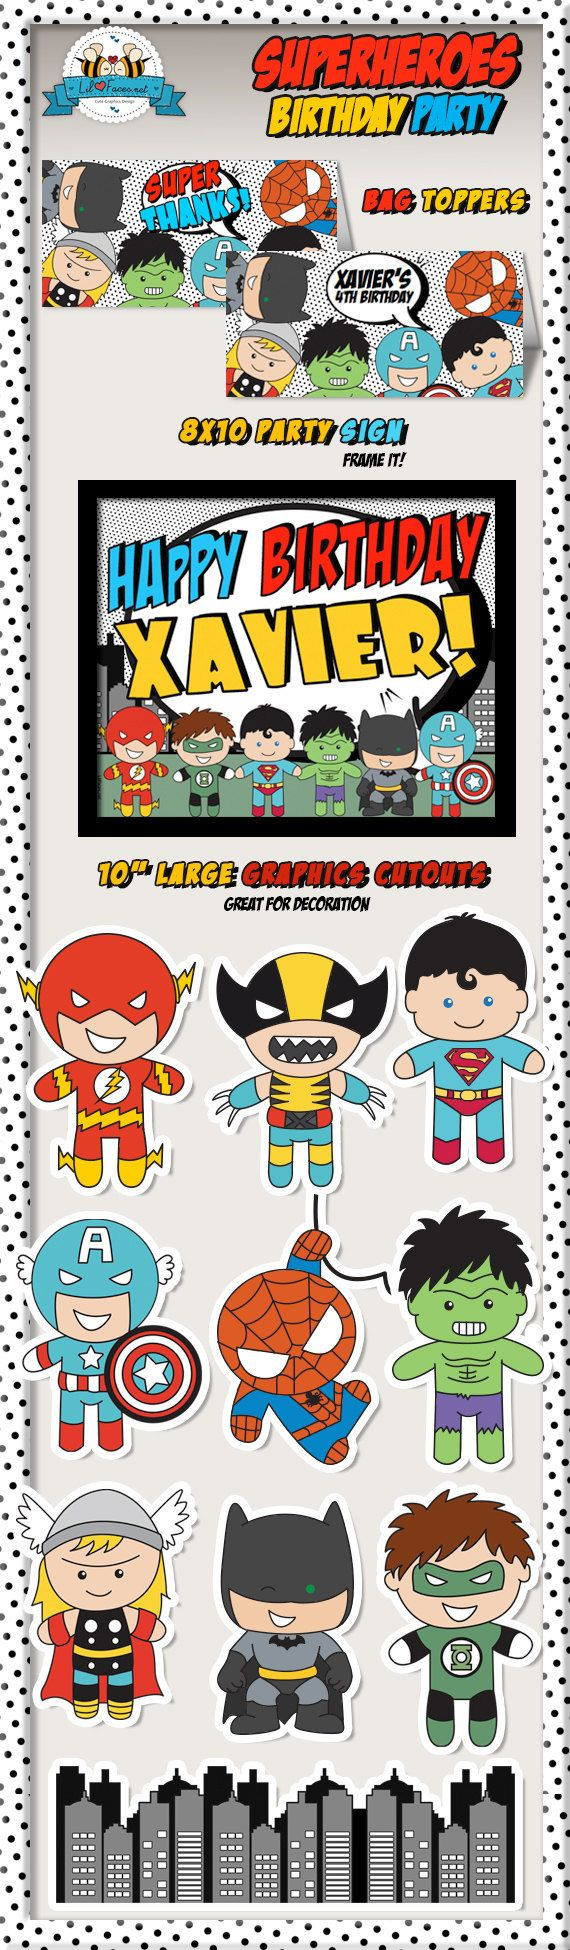 Superheroes Pop Art Superhero Birthday Party by LilFacesPrintables